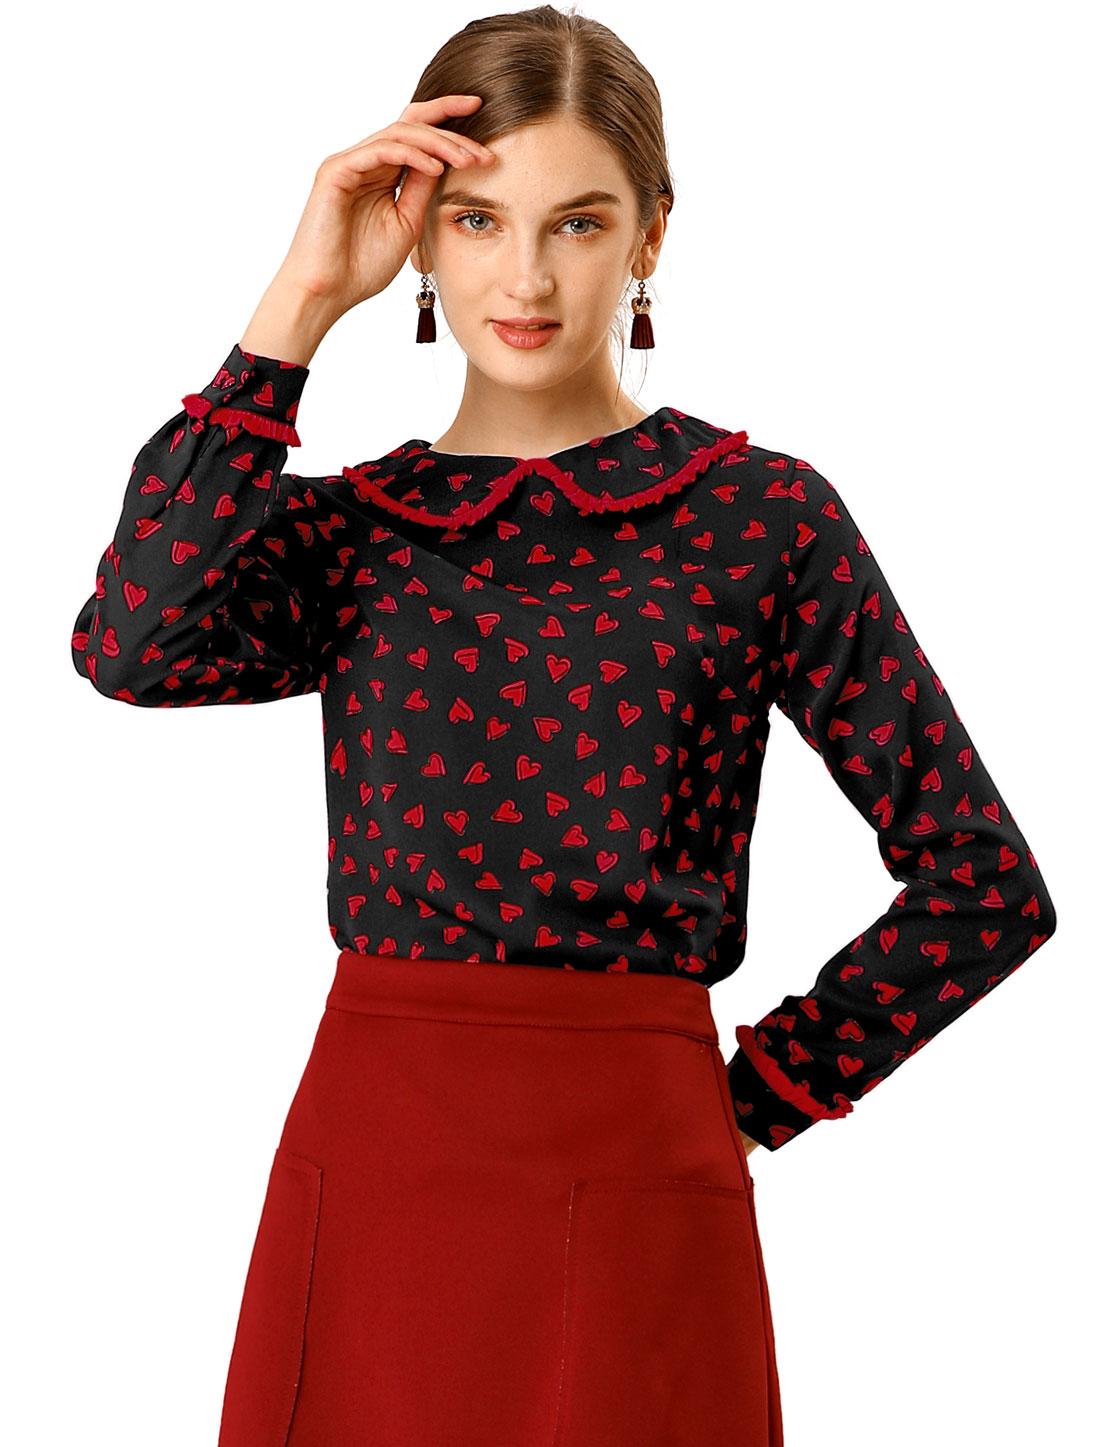 Allegra K Women's Cute Ruffle Peter Pan Collar Blouse Black S